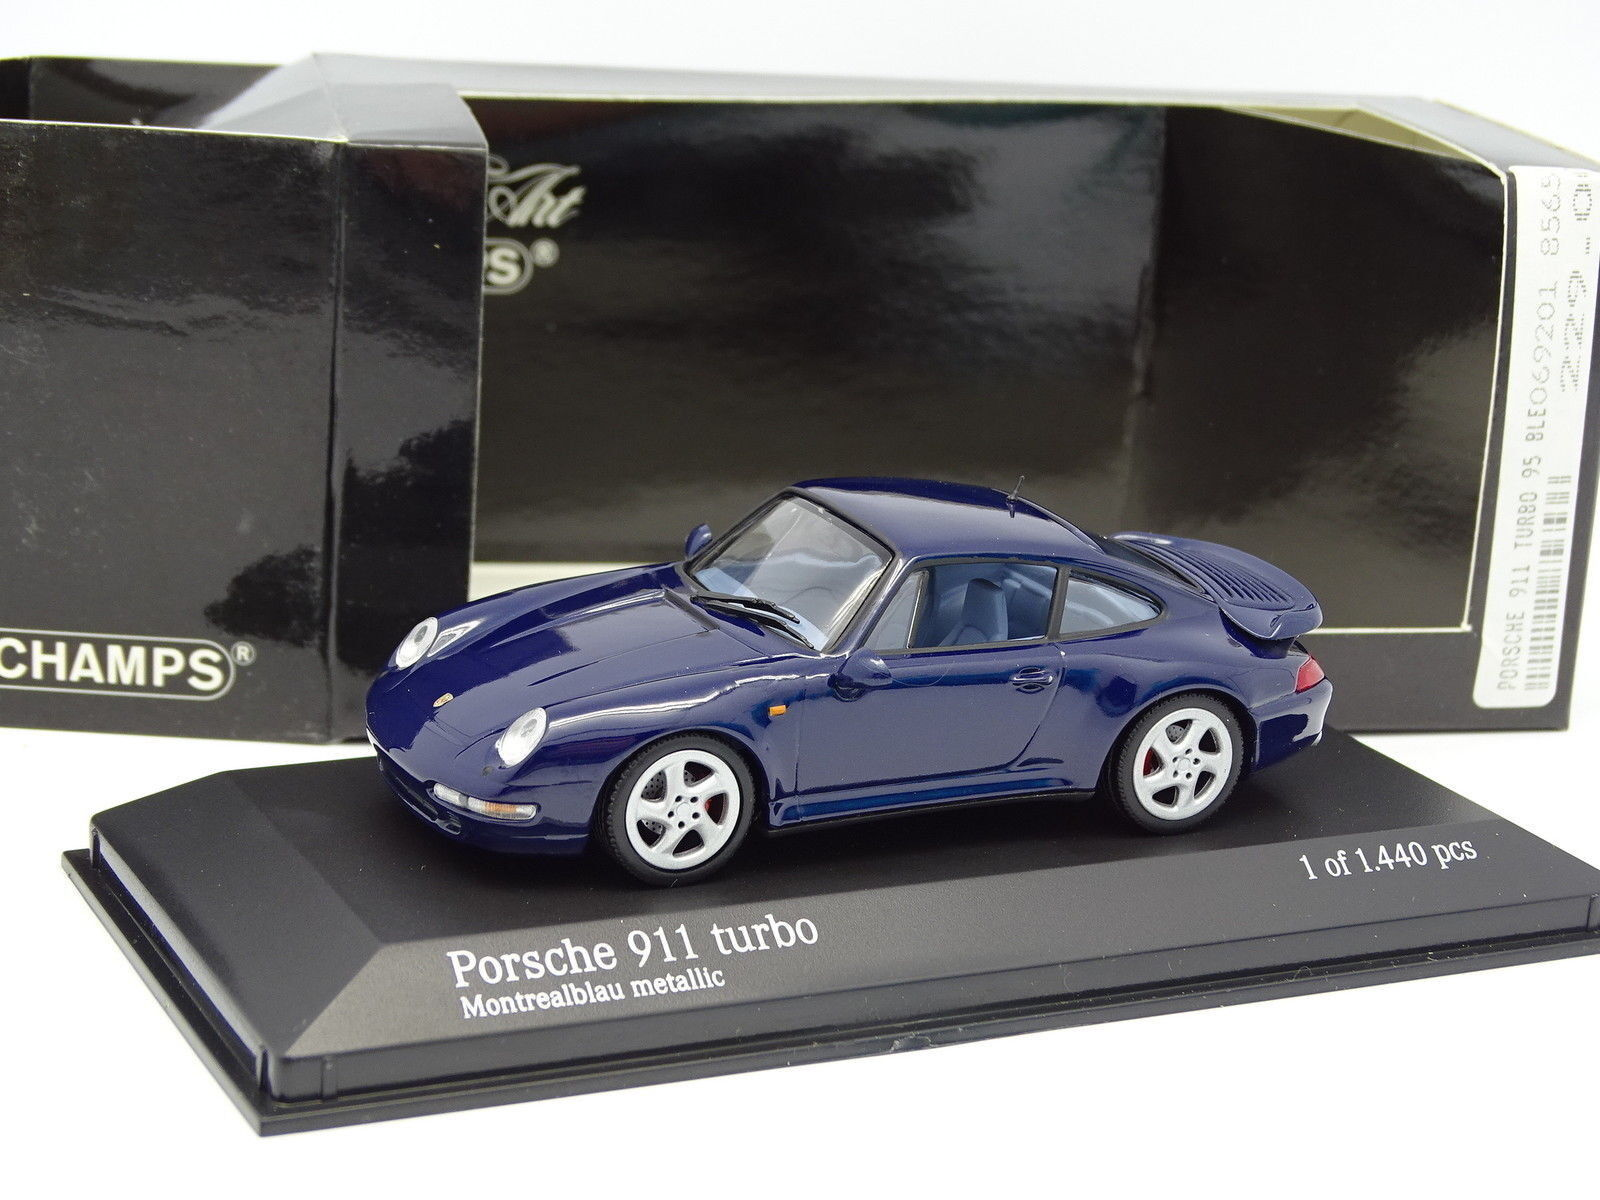 Minichamps 1 43 - Porsche 911 993 Turbo Montrealbleu